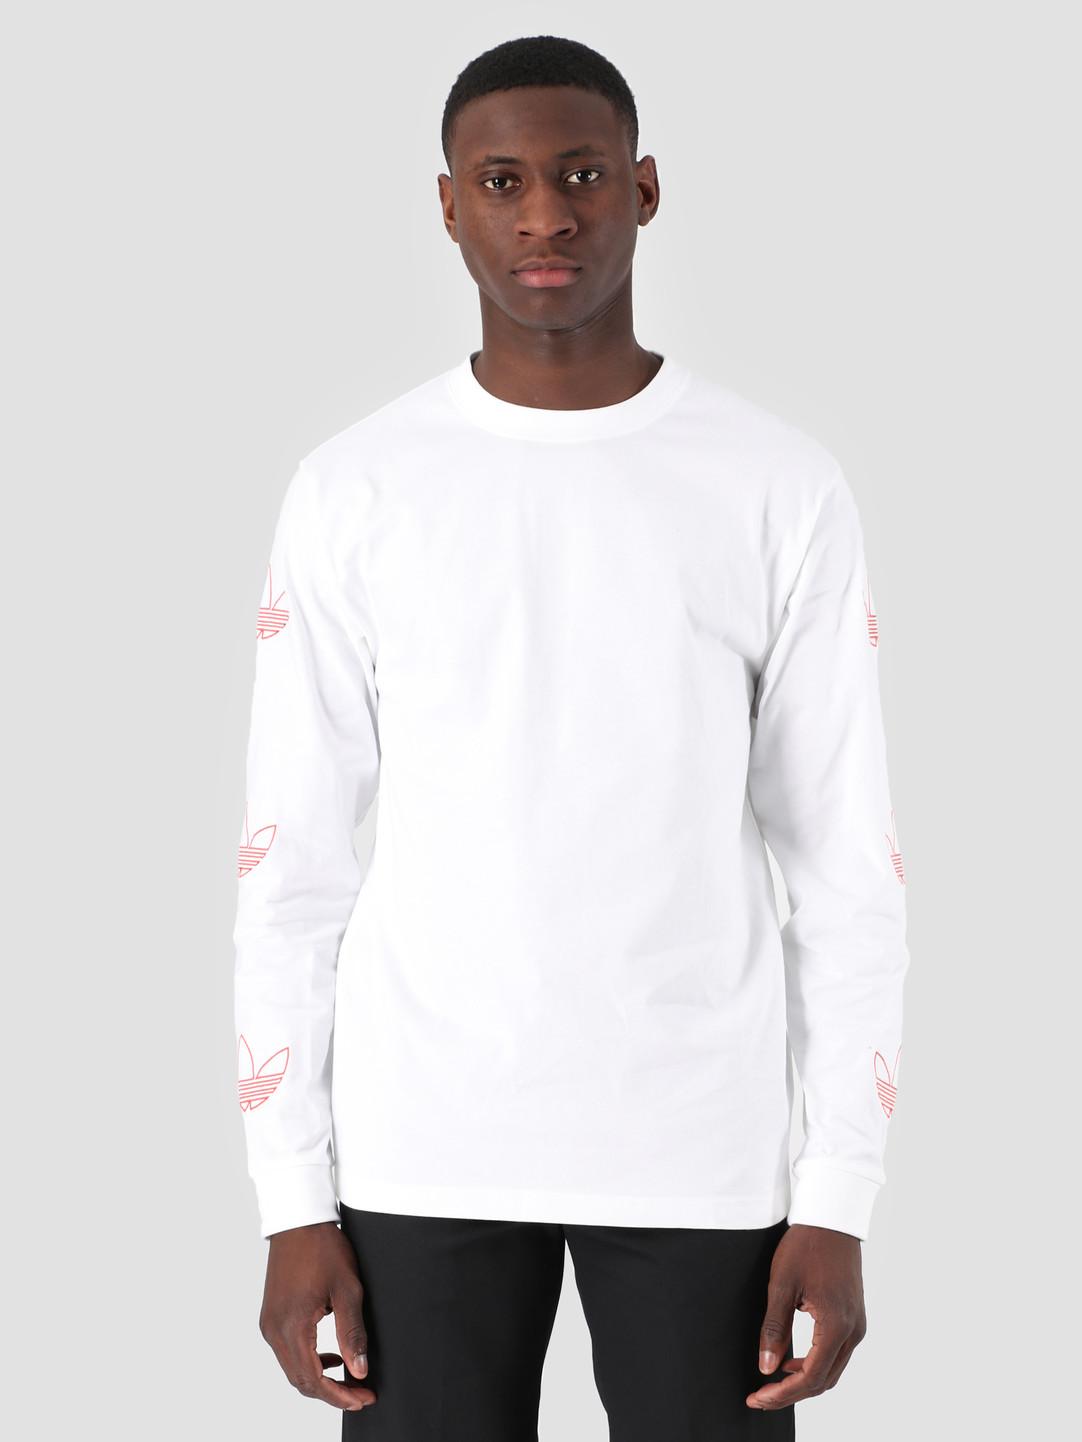 045c482fbdb8f0 adidas Longsleeve Trefoil T-Shirt White Rawamb DV3151 | FRESHCOTTON